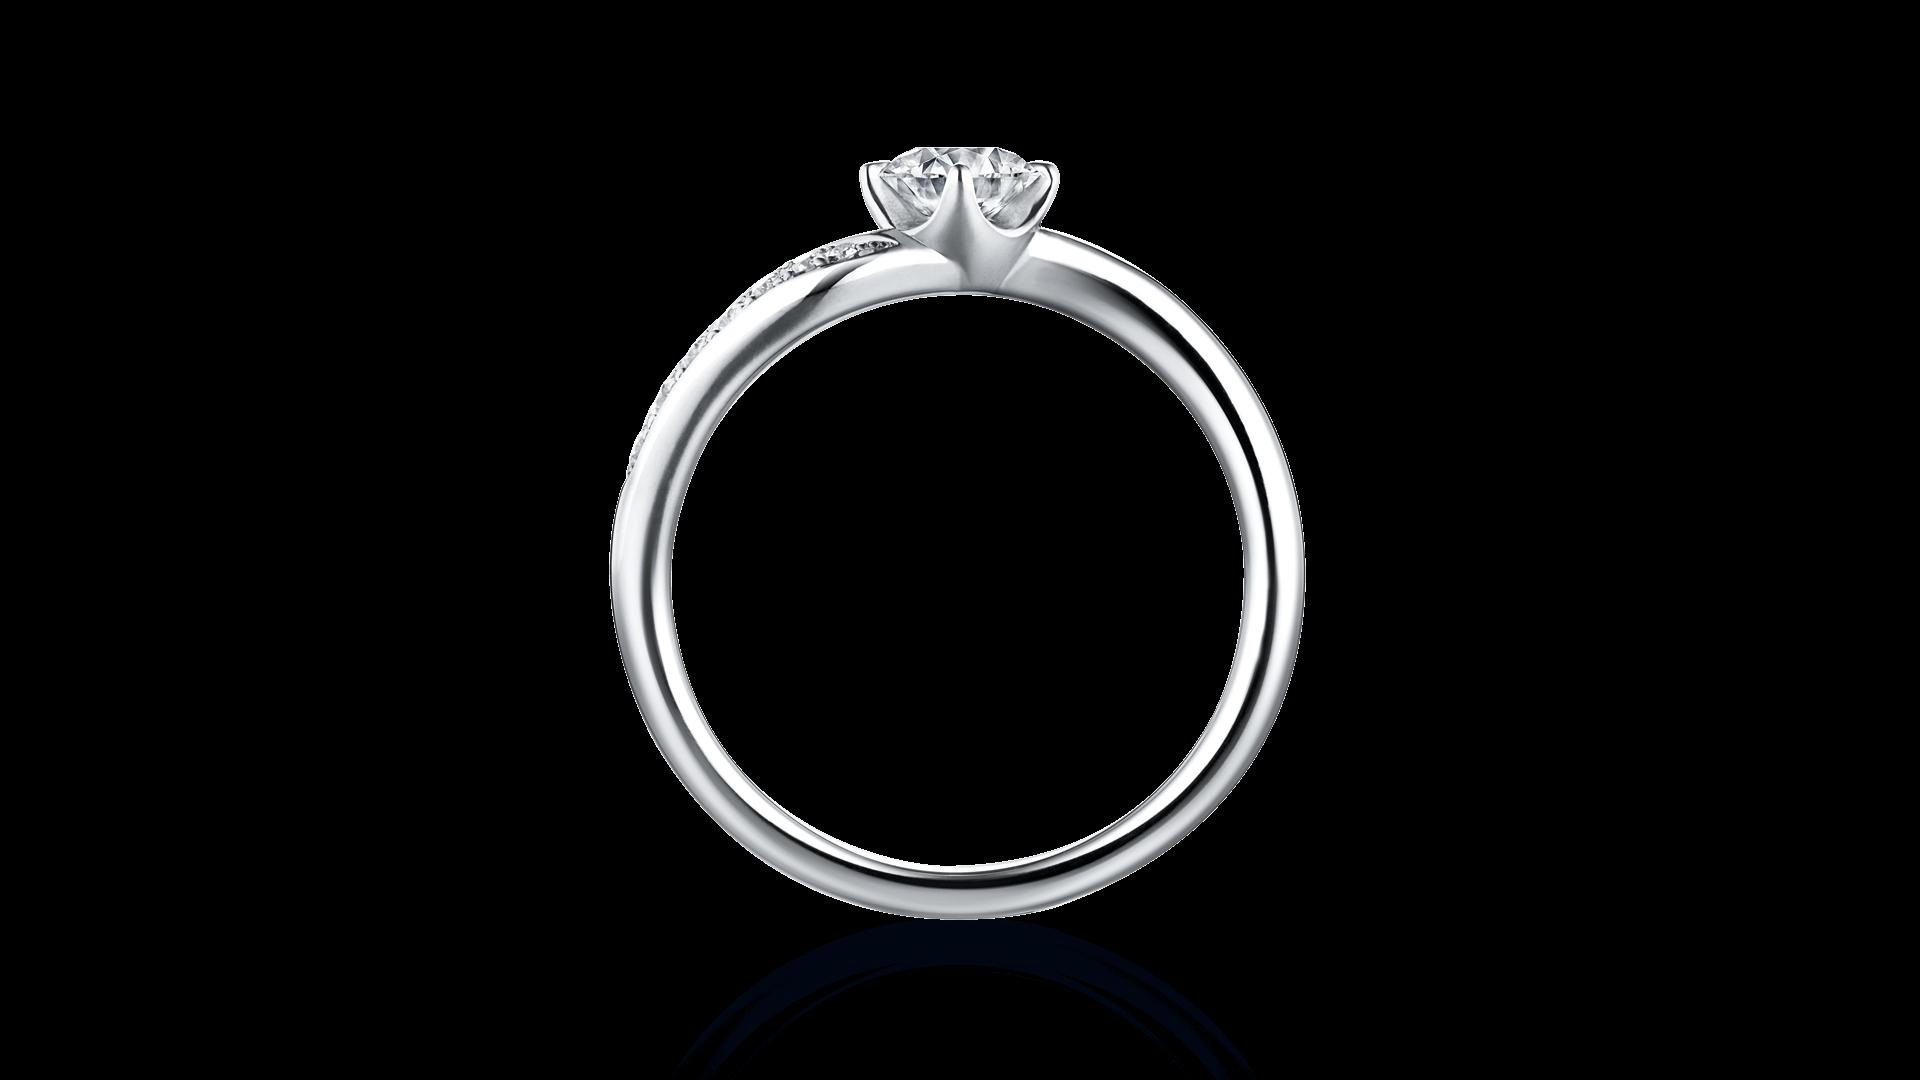 plough プラウ | 婚約指輪サムネイル 2